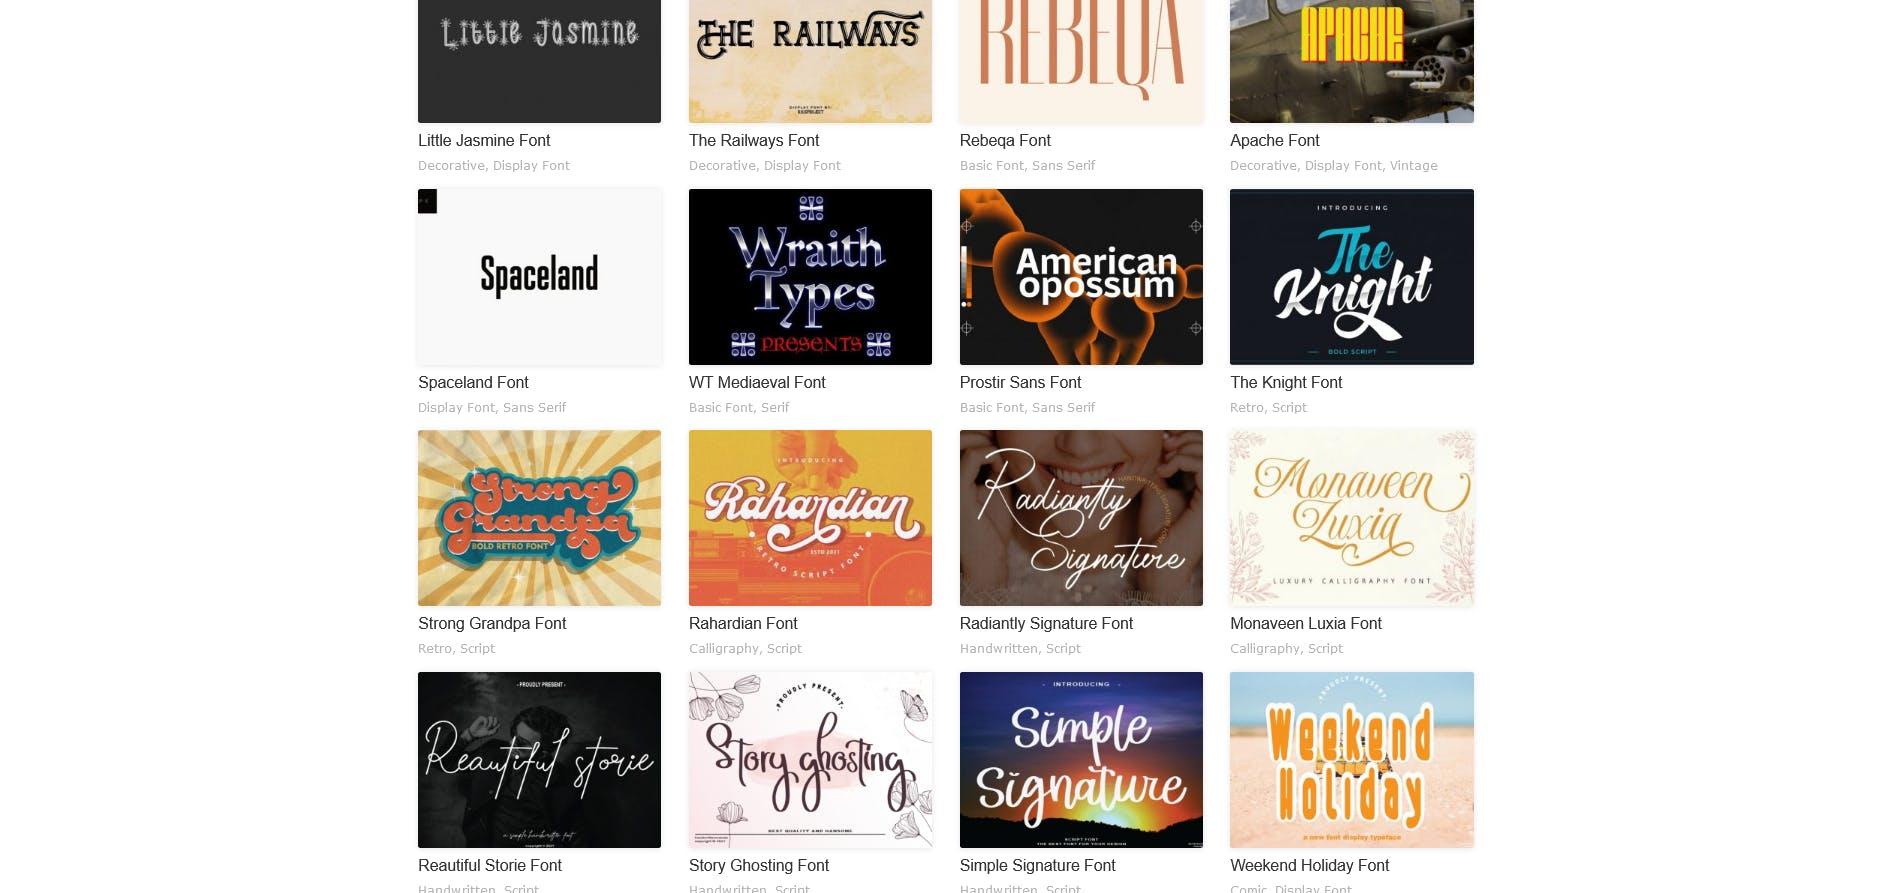 Screenshot 2021-04-29 at 20-52-03 Free Font Lists - Befonts - Download free fonts.png